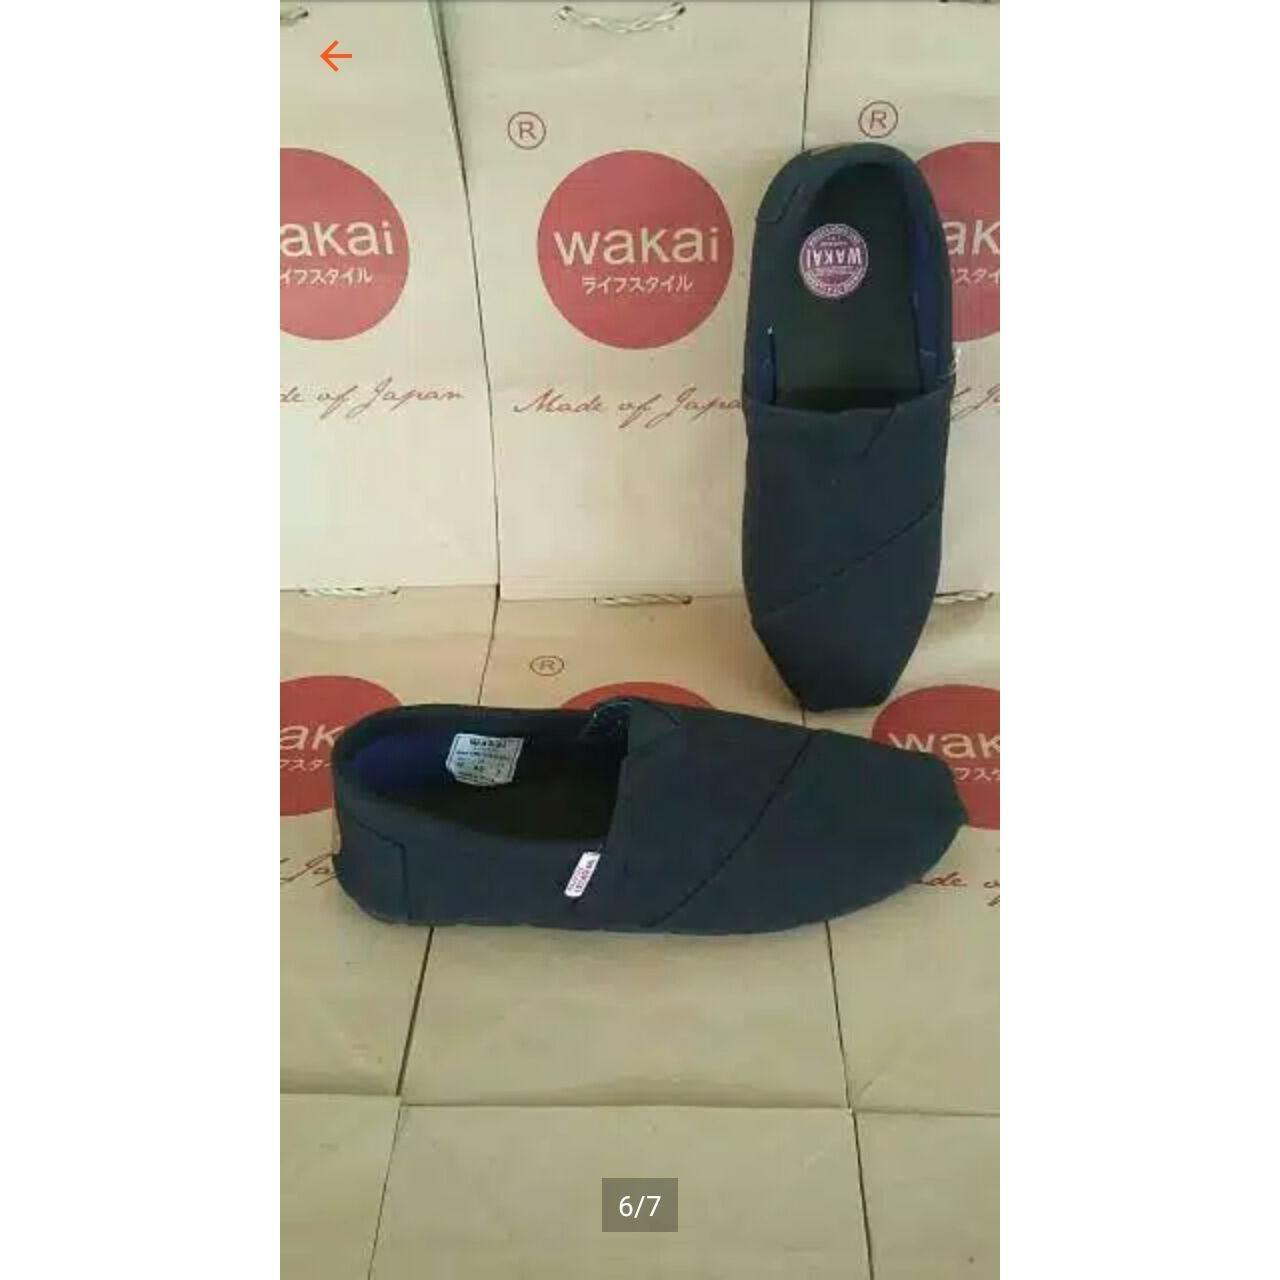 Jual Beli Sepatu Wakai 06